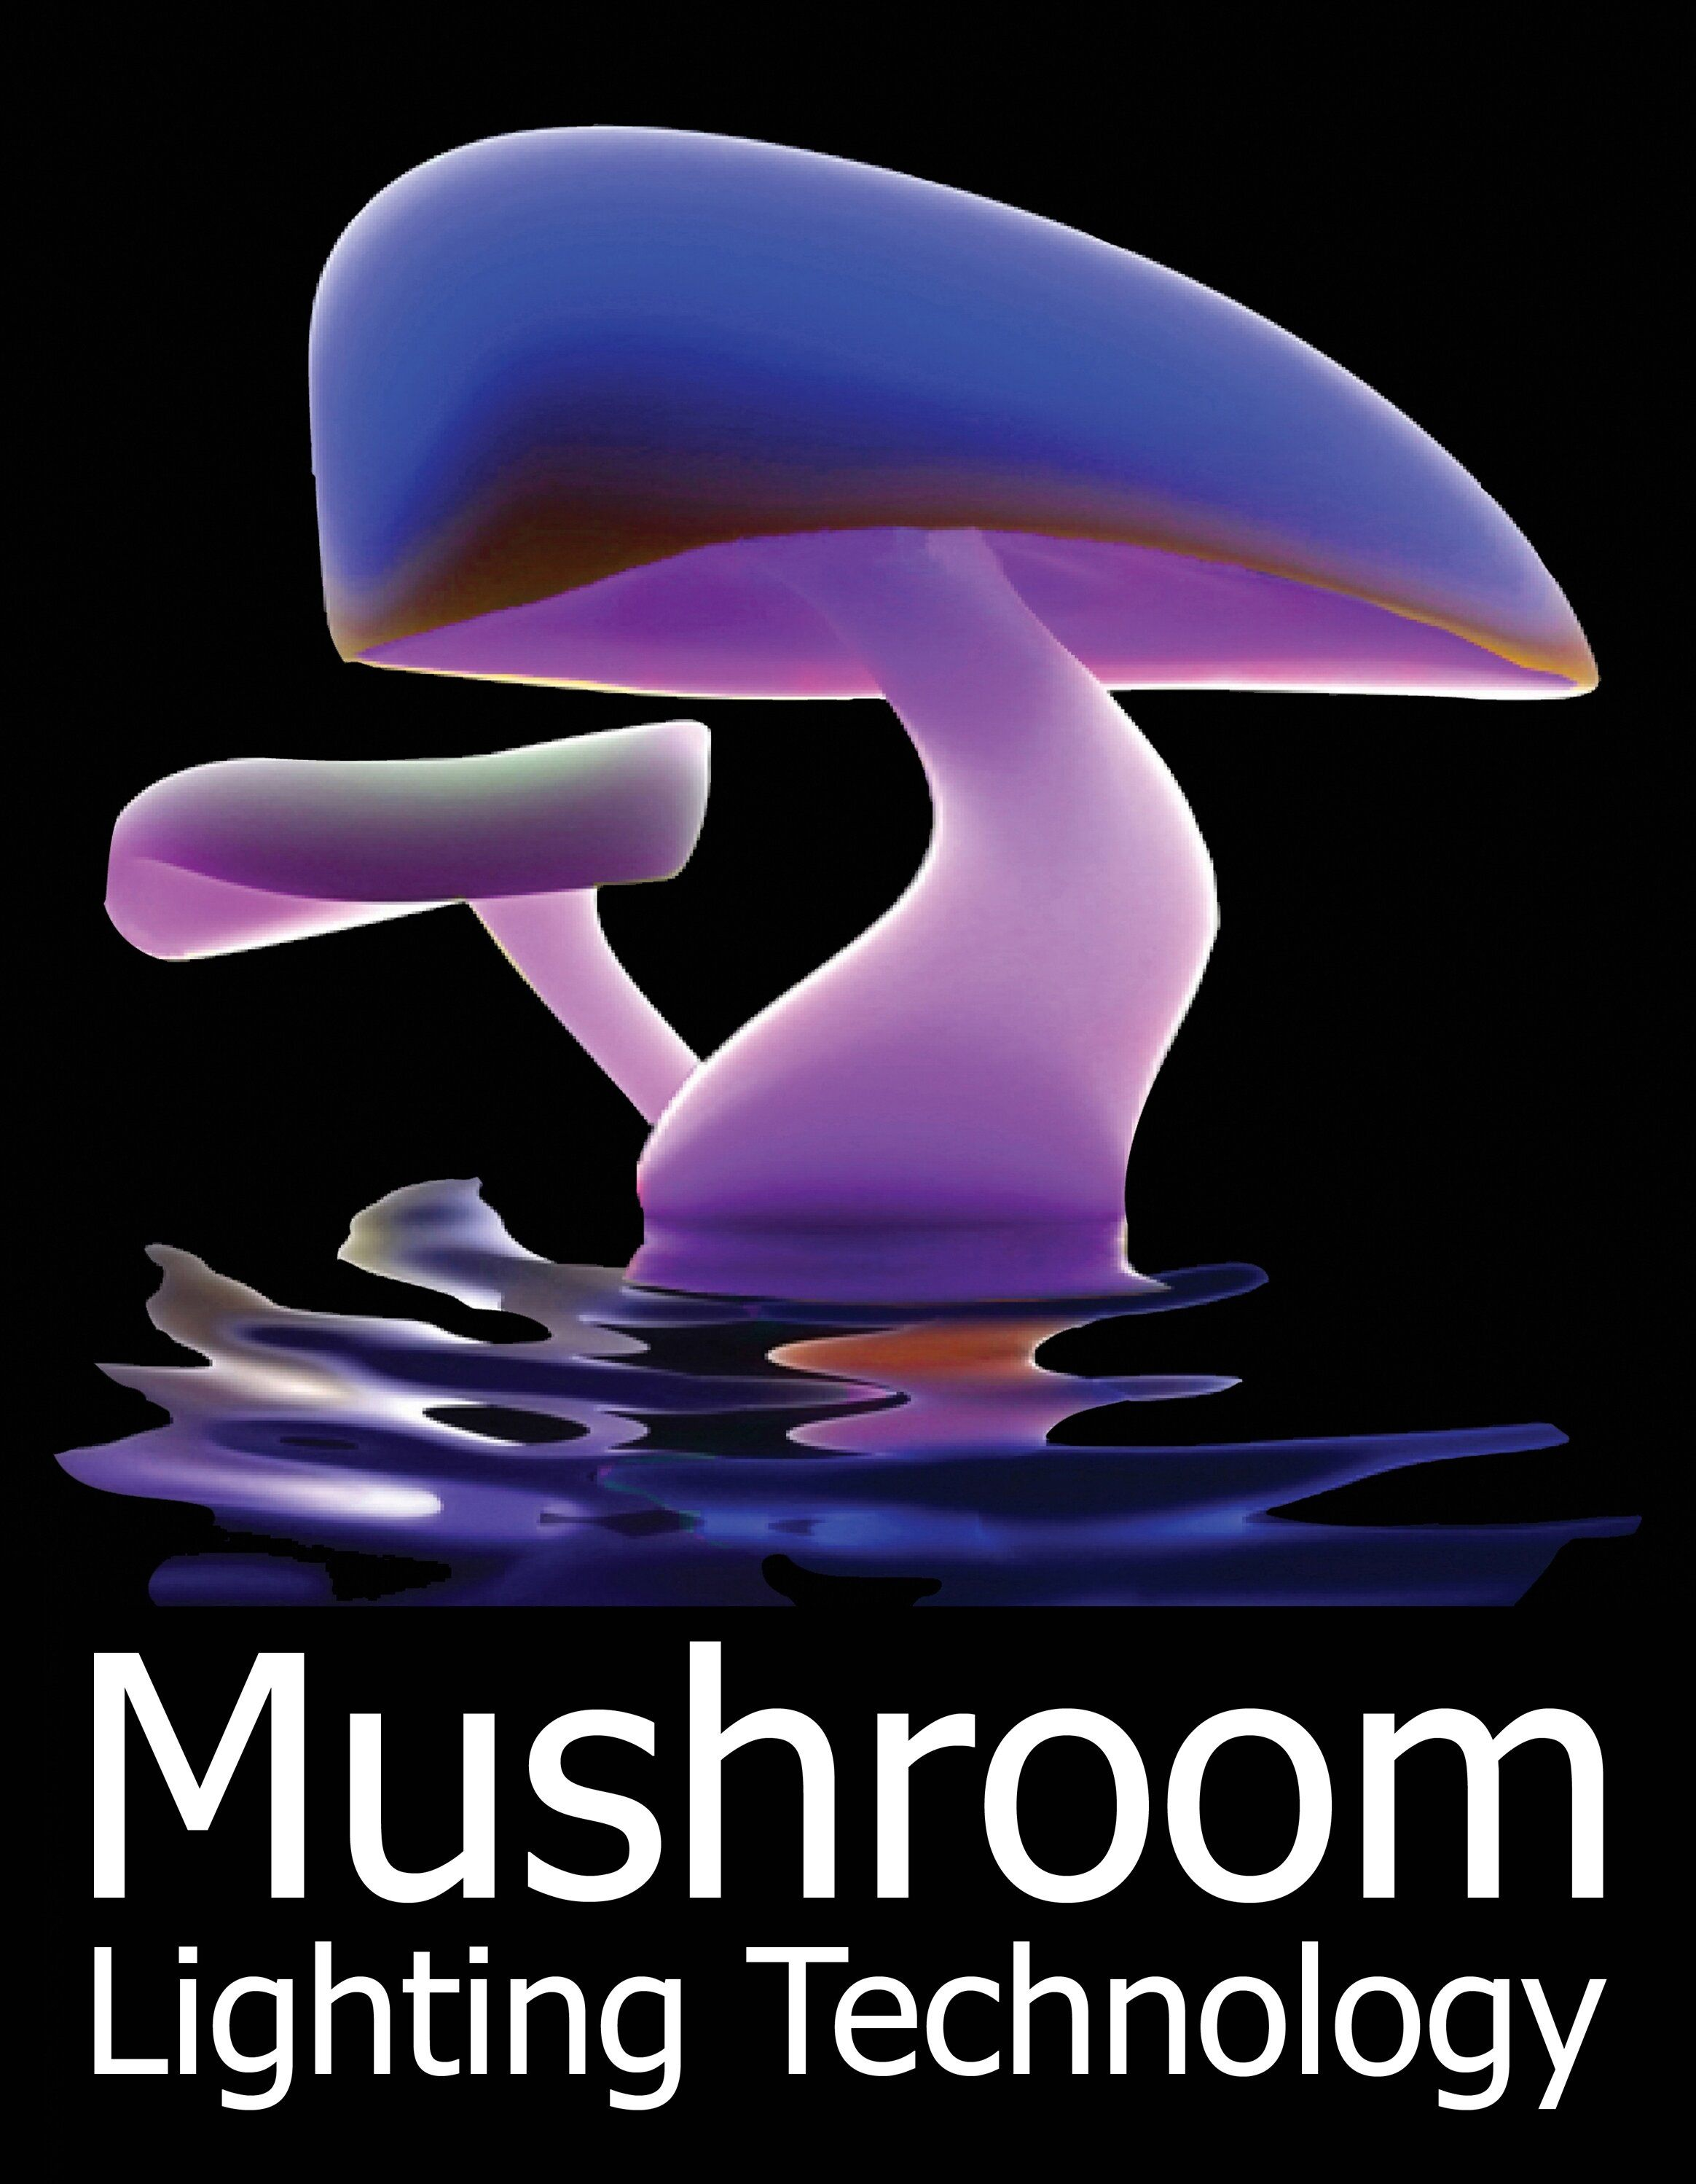 Mushroom Lighting